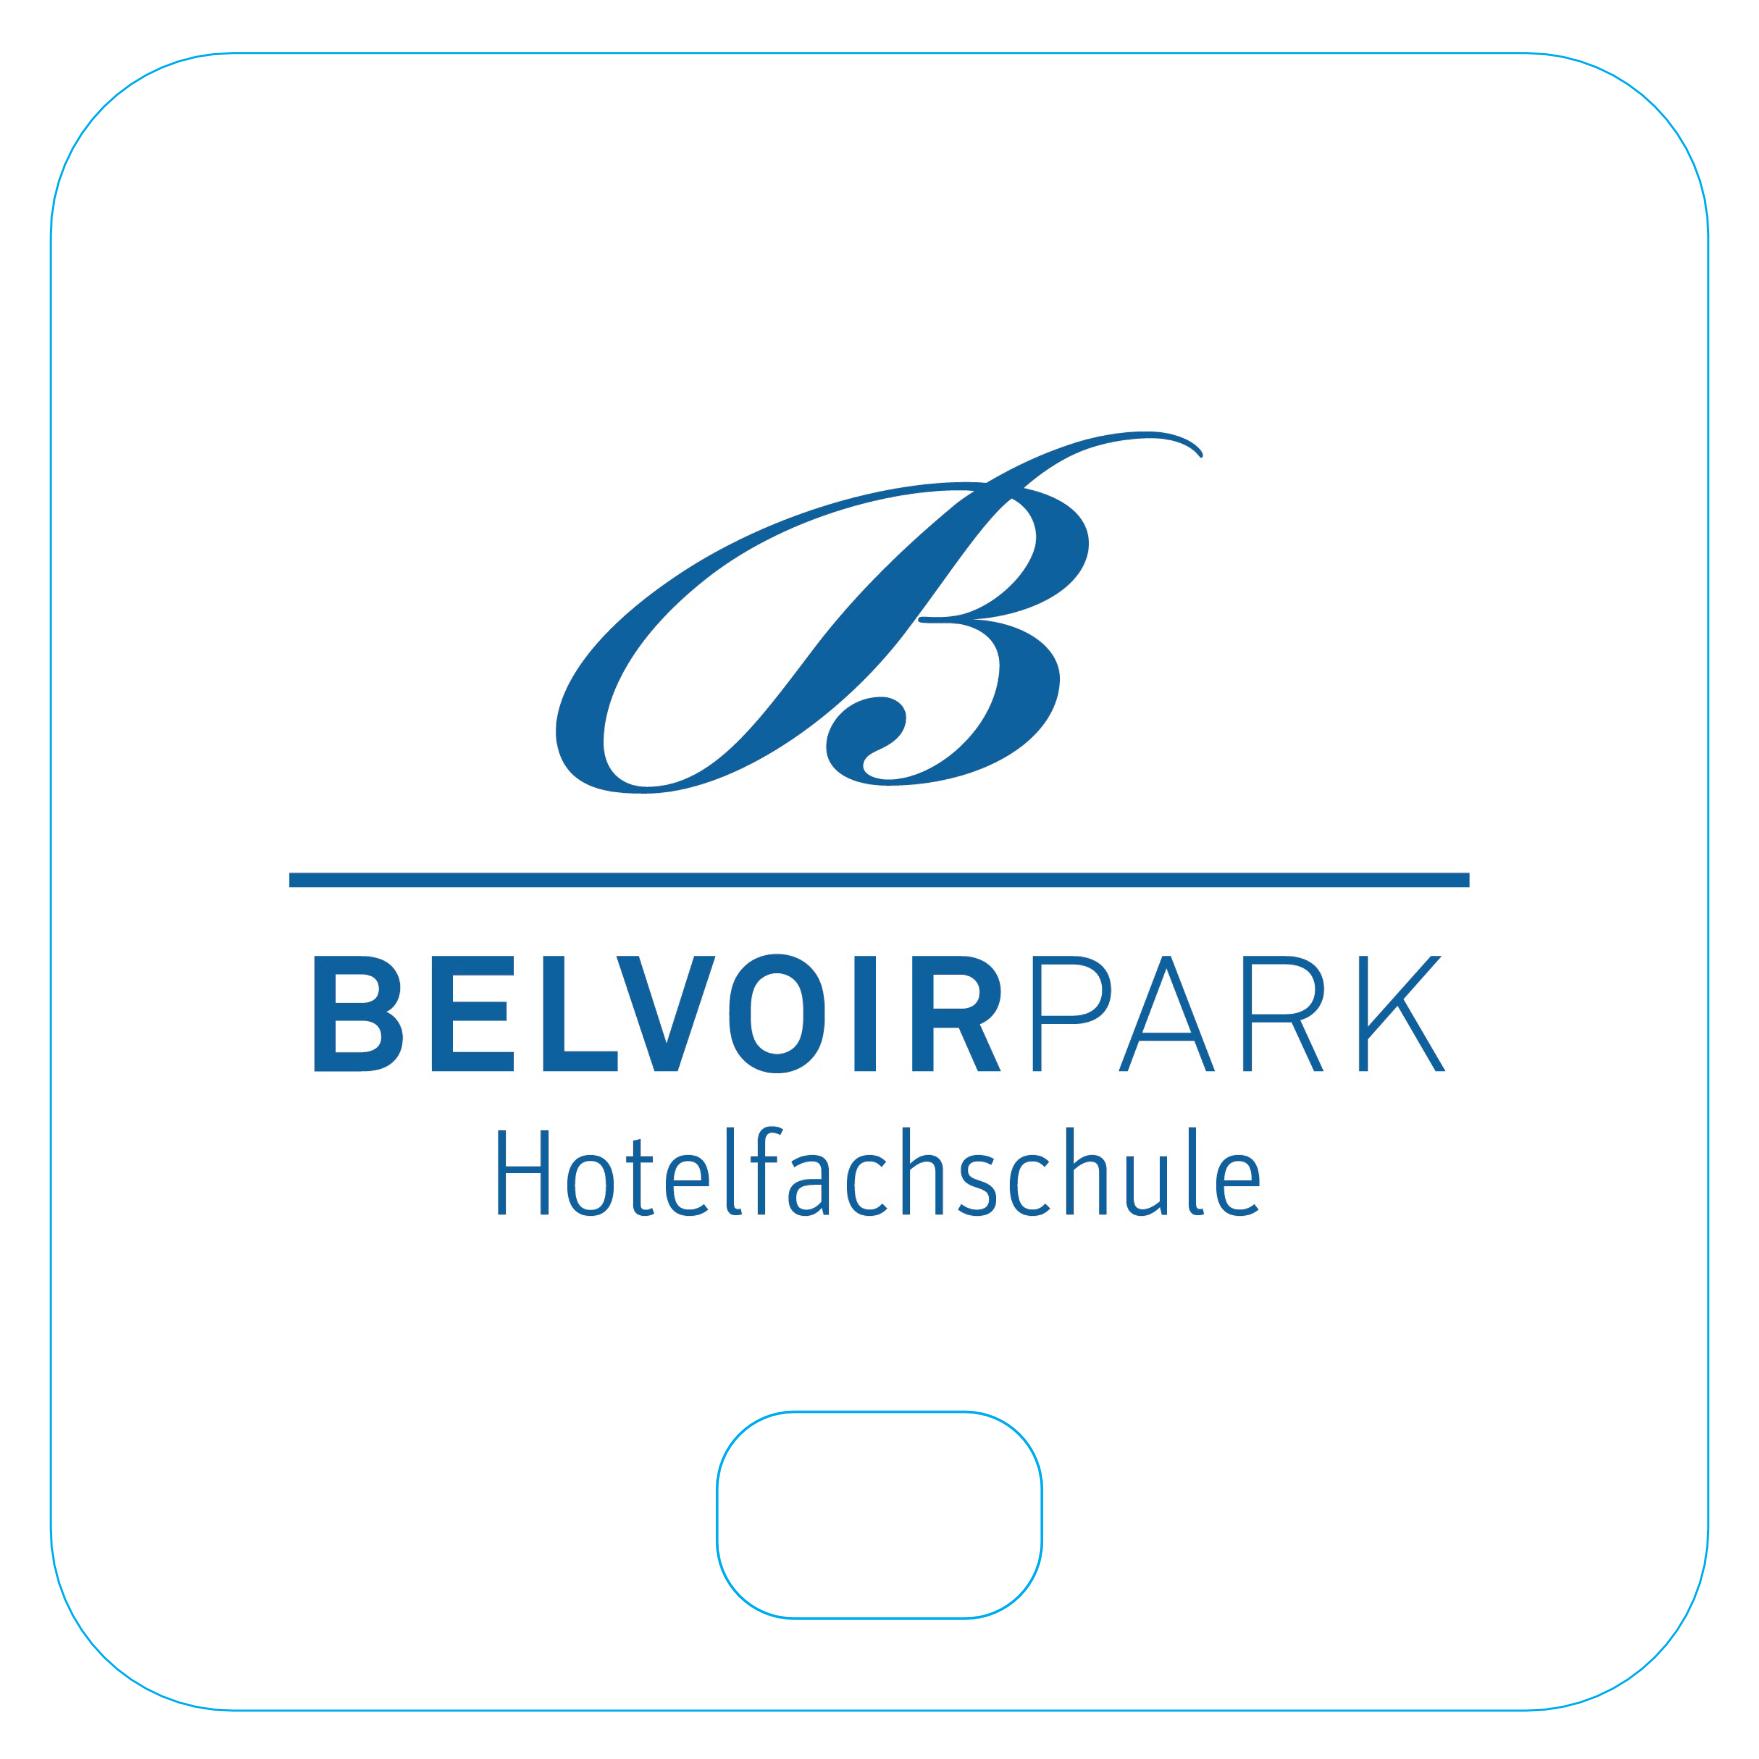 Belvoirpark 70.2 x 70.2